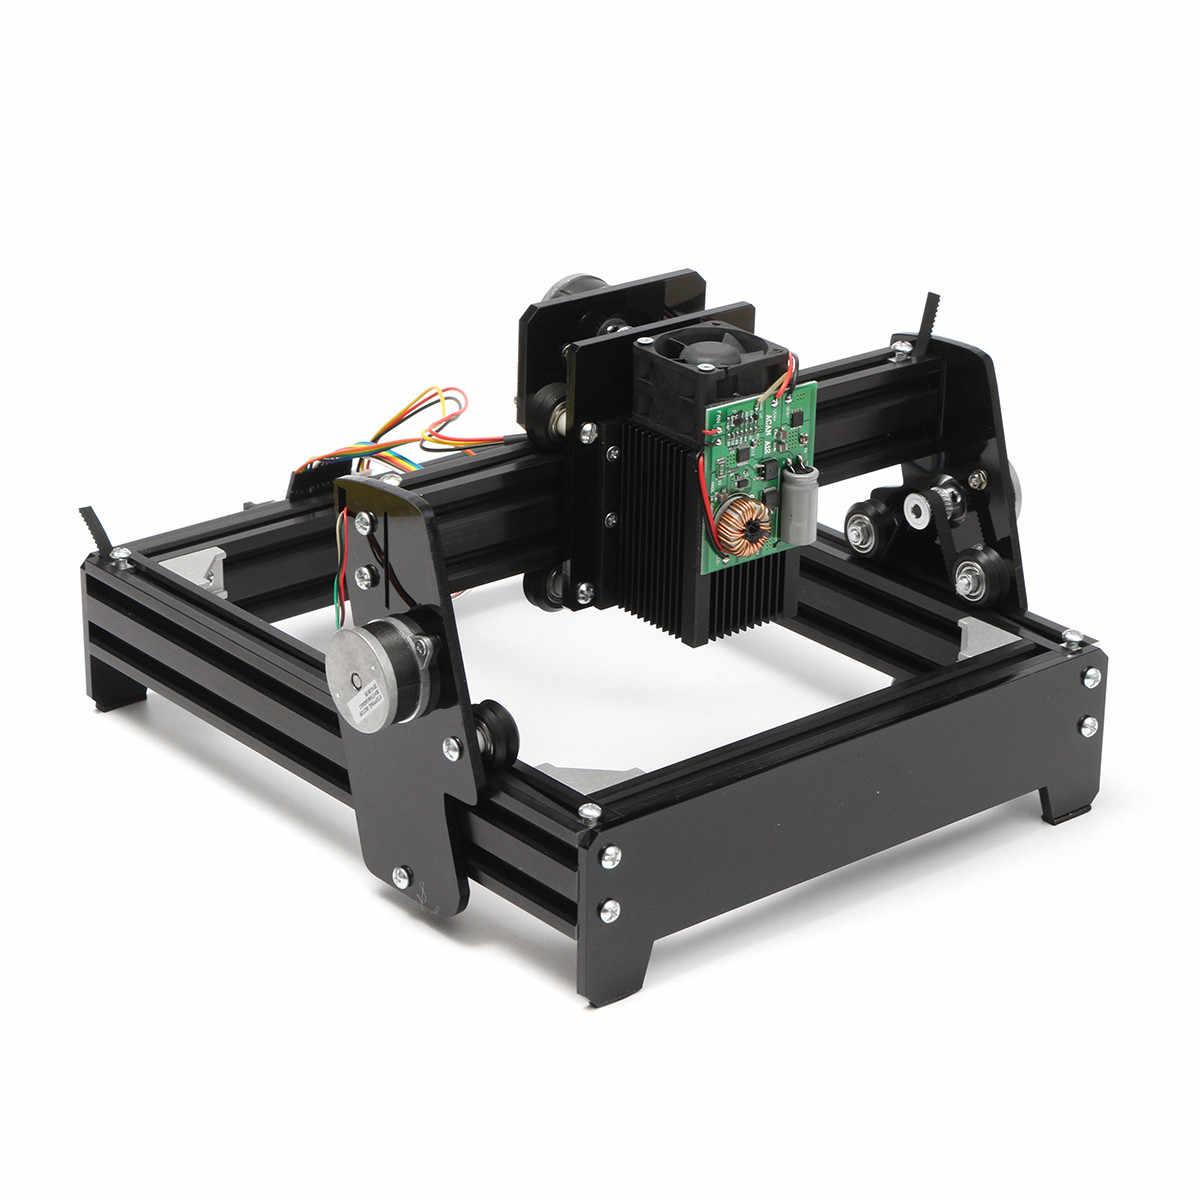 10 W Laser Mesin Ukiran DIY USB Metal Lath Batu Gambar Router Printer Laser Menandai Mesin Router Kayu USB